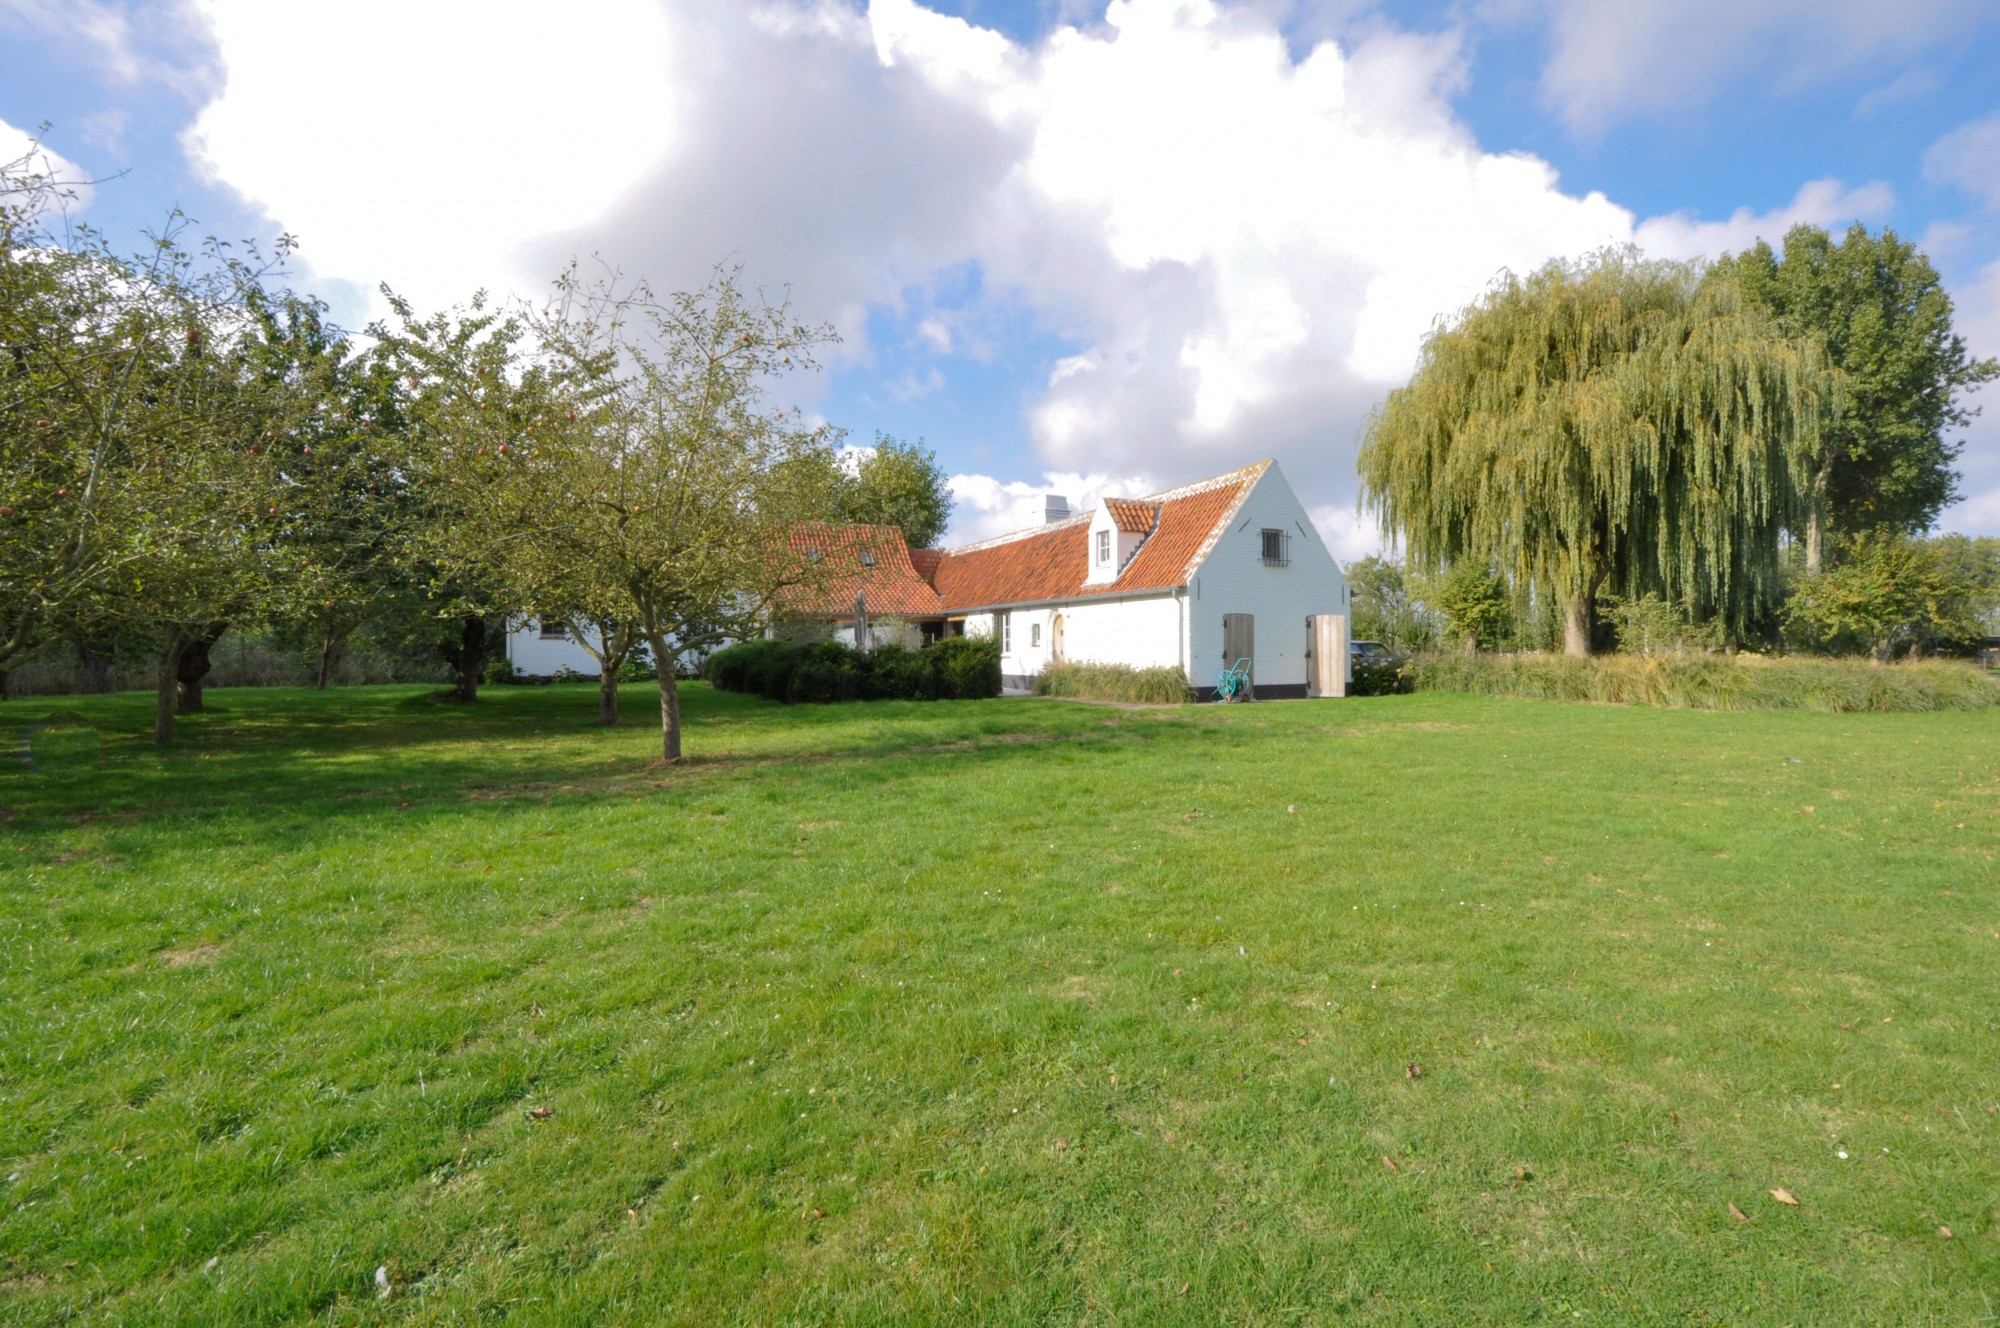 Vente Maison 5 CH Damme / Oostkerke ferme rénovée du 18eme siècle